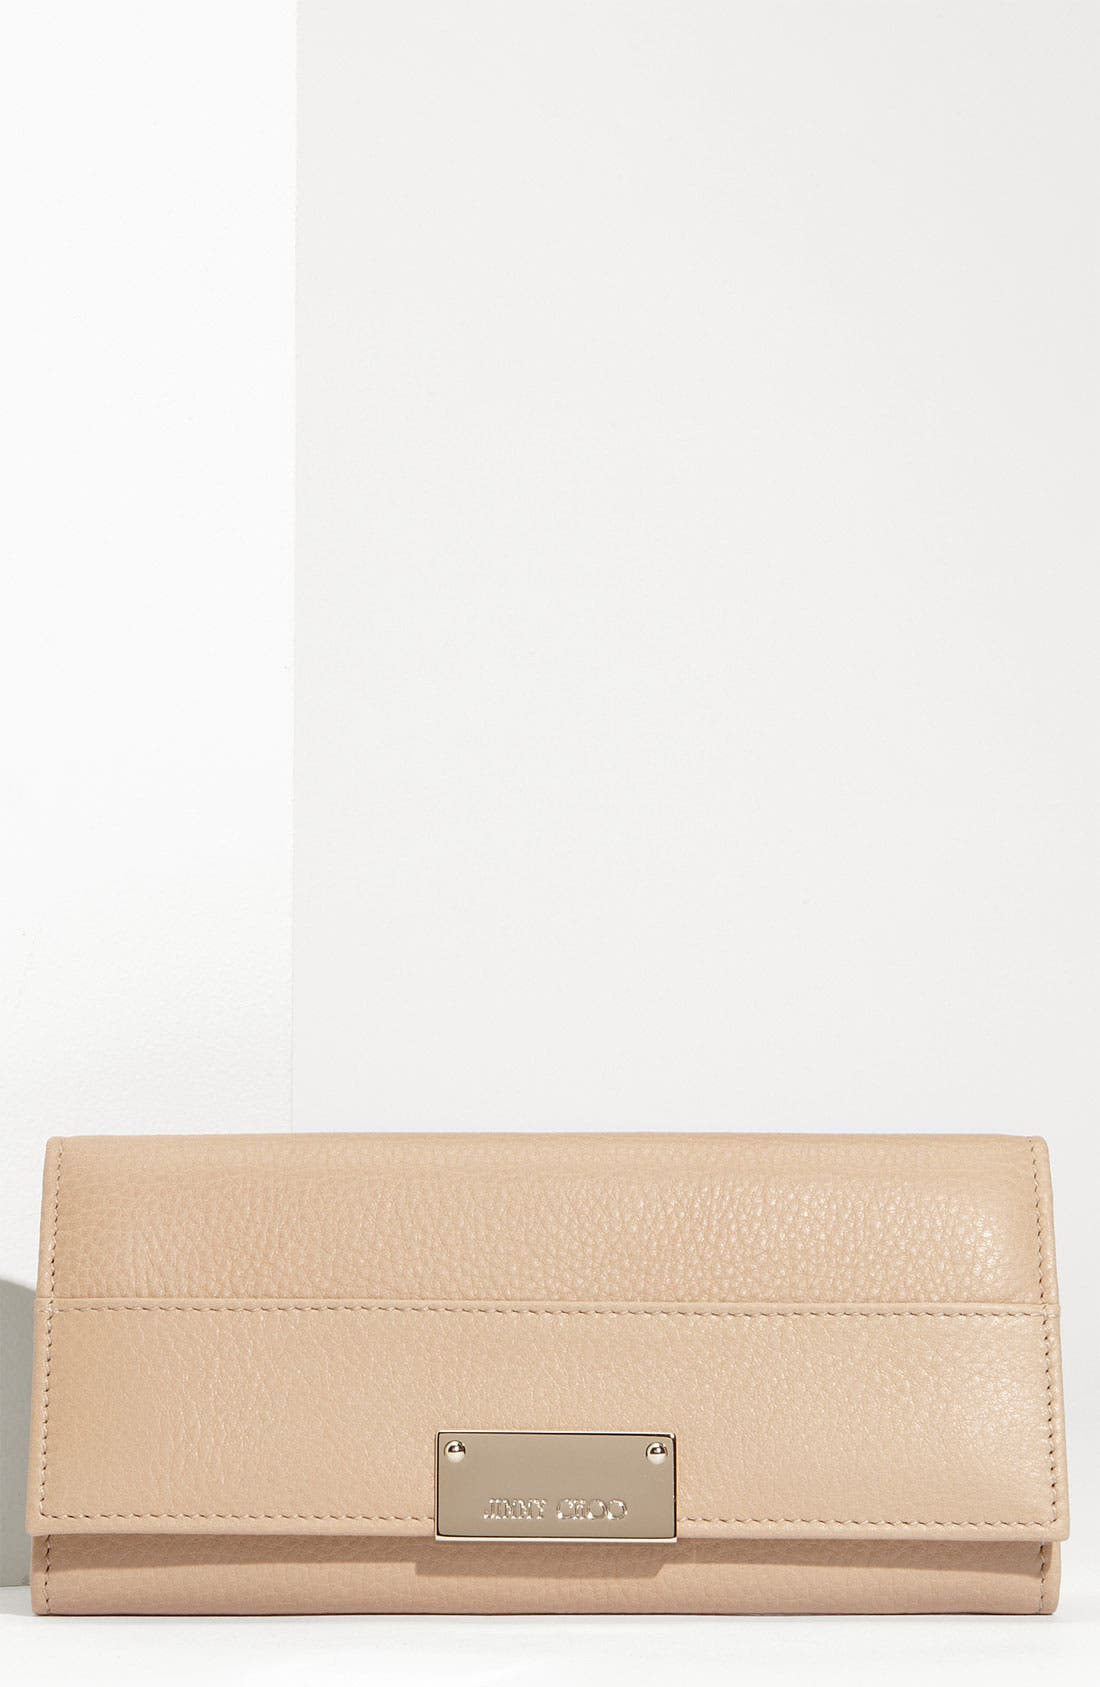 Main Image - Jimmy Choo 'Reza' Calfskin Leather Wallet